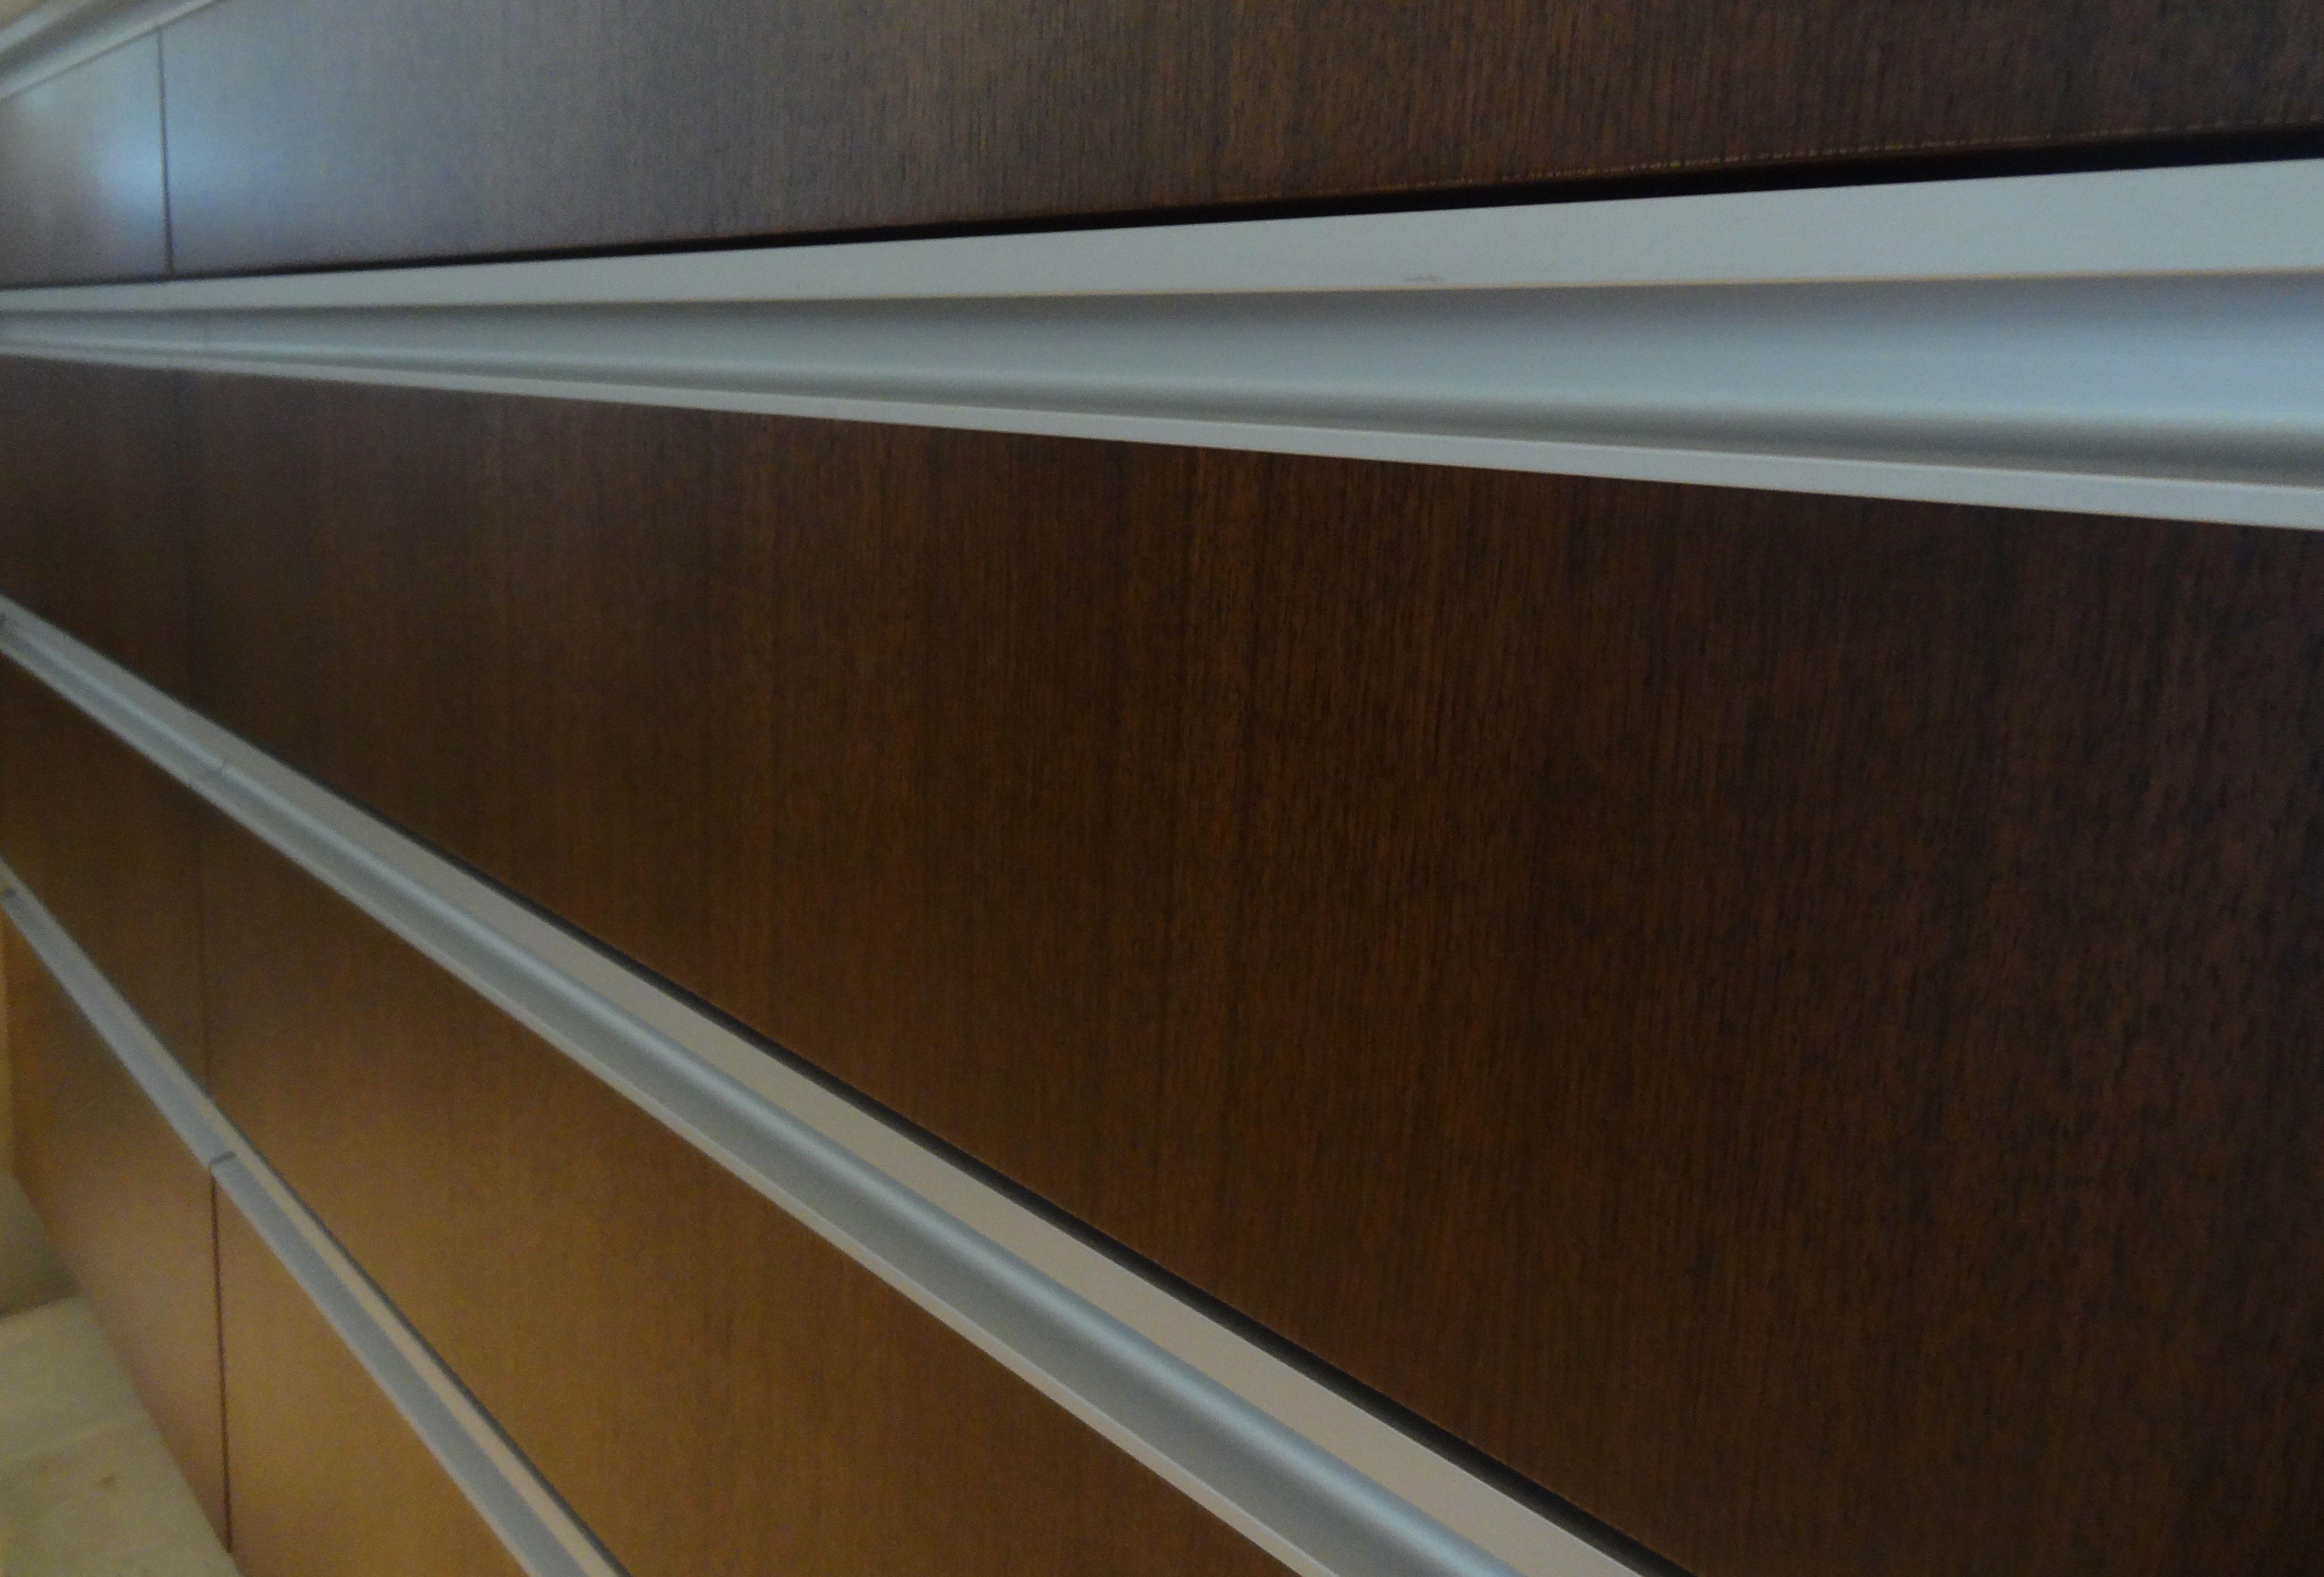 Continuous Pull Handles Aluminum Glass Cabinet Doors Kitchen